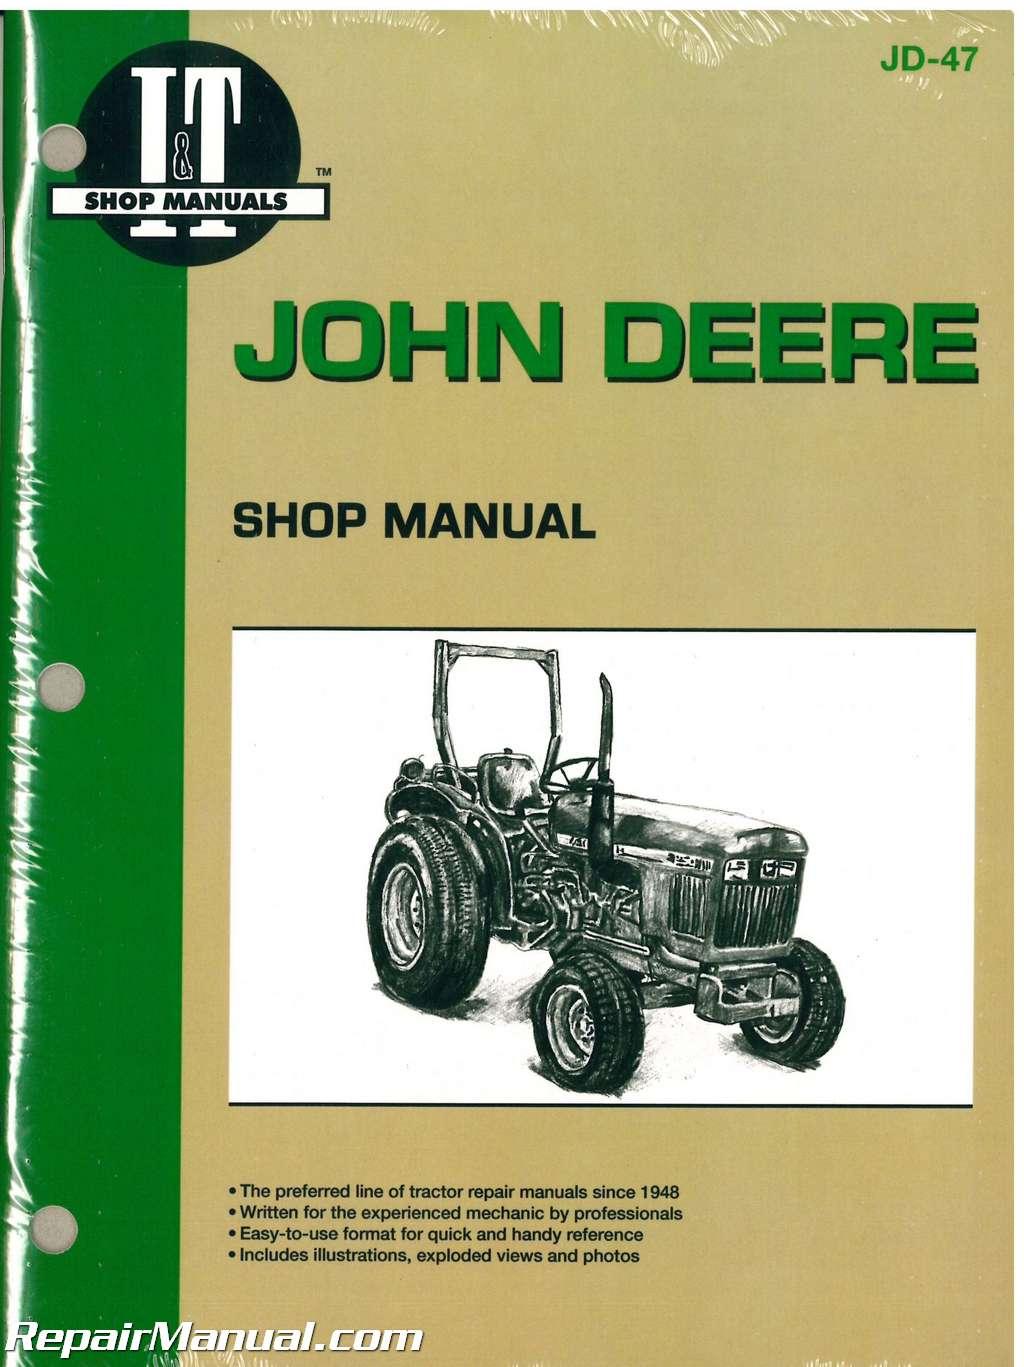 John Deere 950 Wiring Diagram For Alternator John Deere 850 950 1050 Farm Tractor Workshop Manual